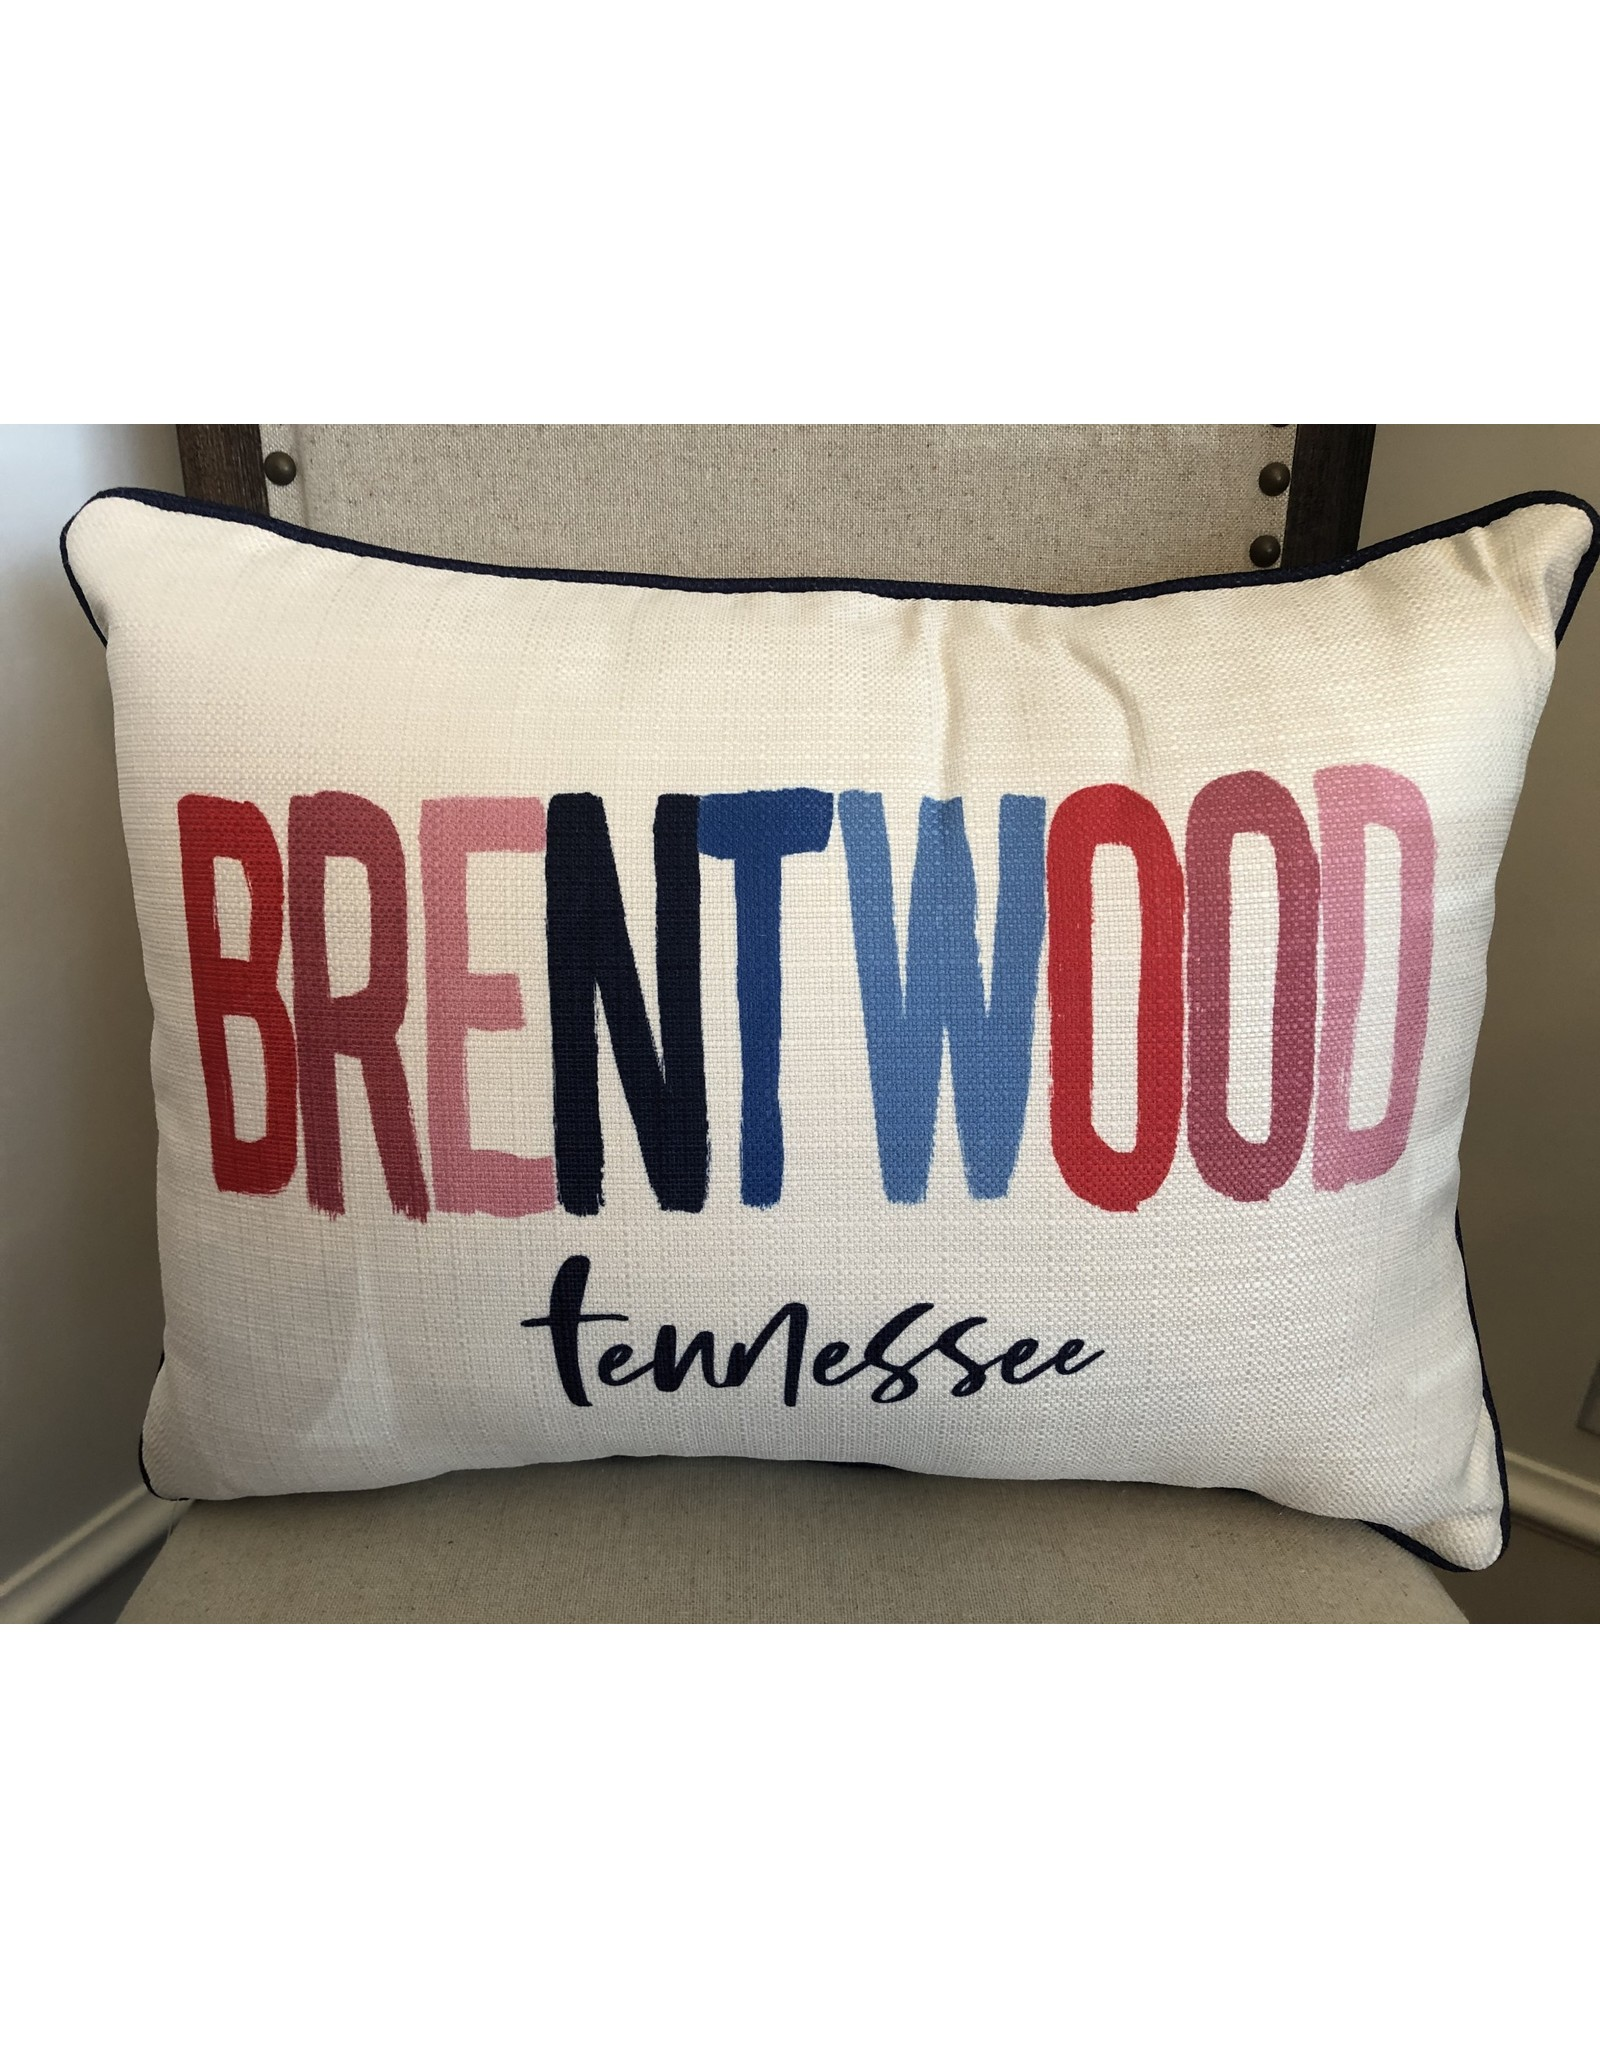 Little Birdie Brentwood Poster Pillow